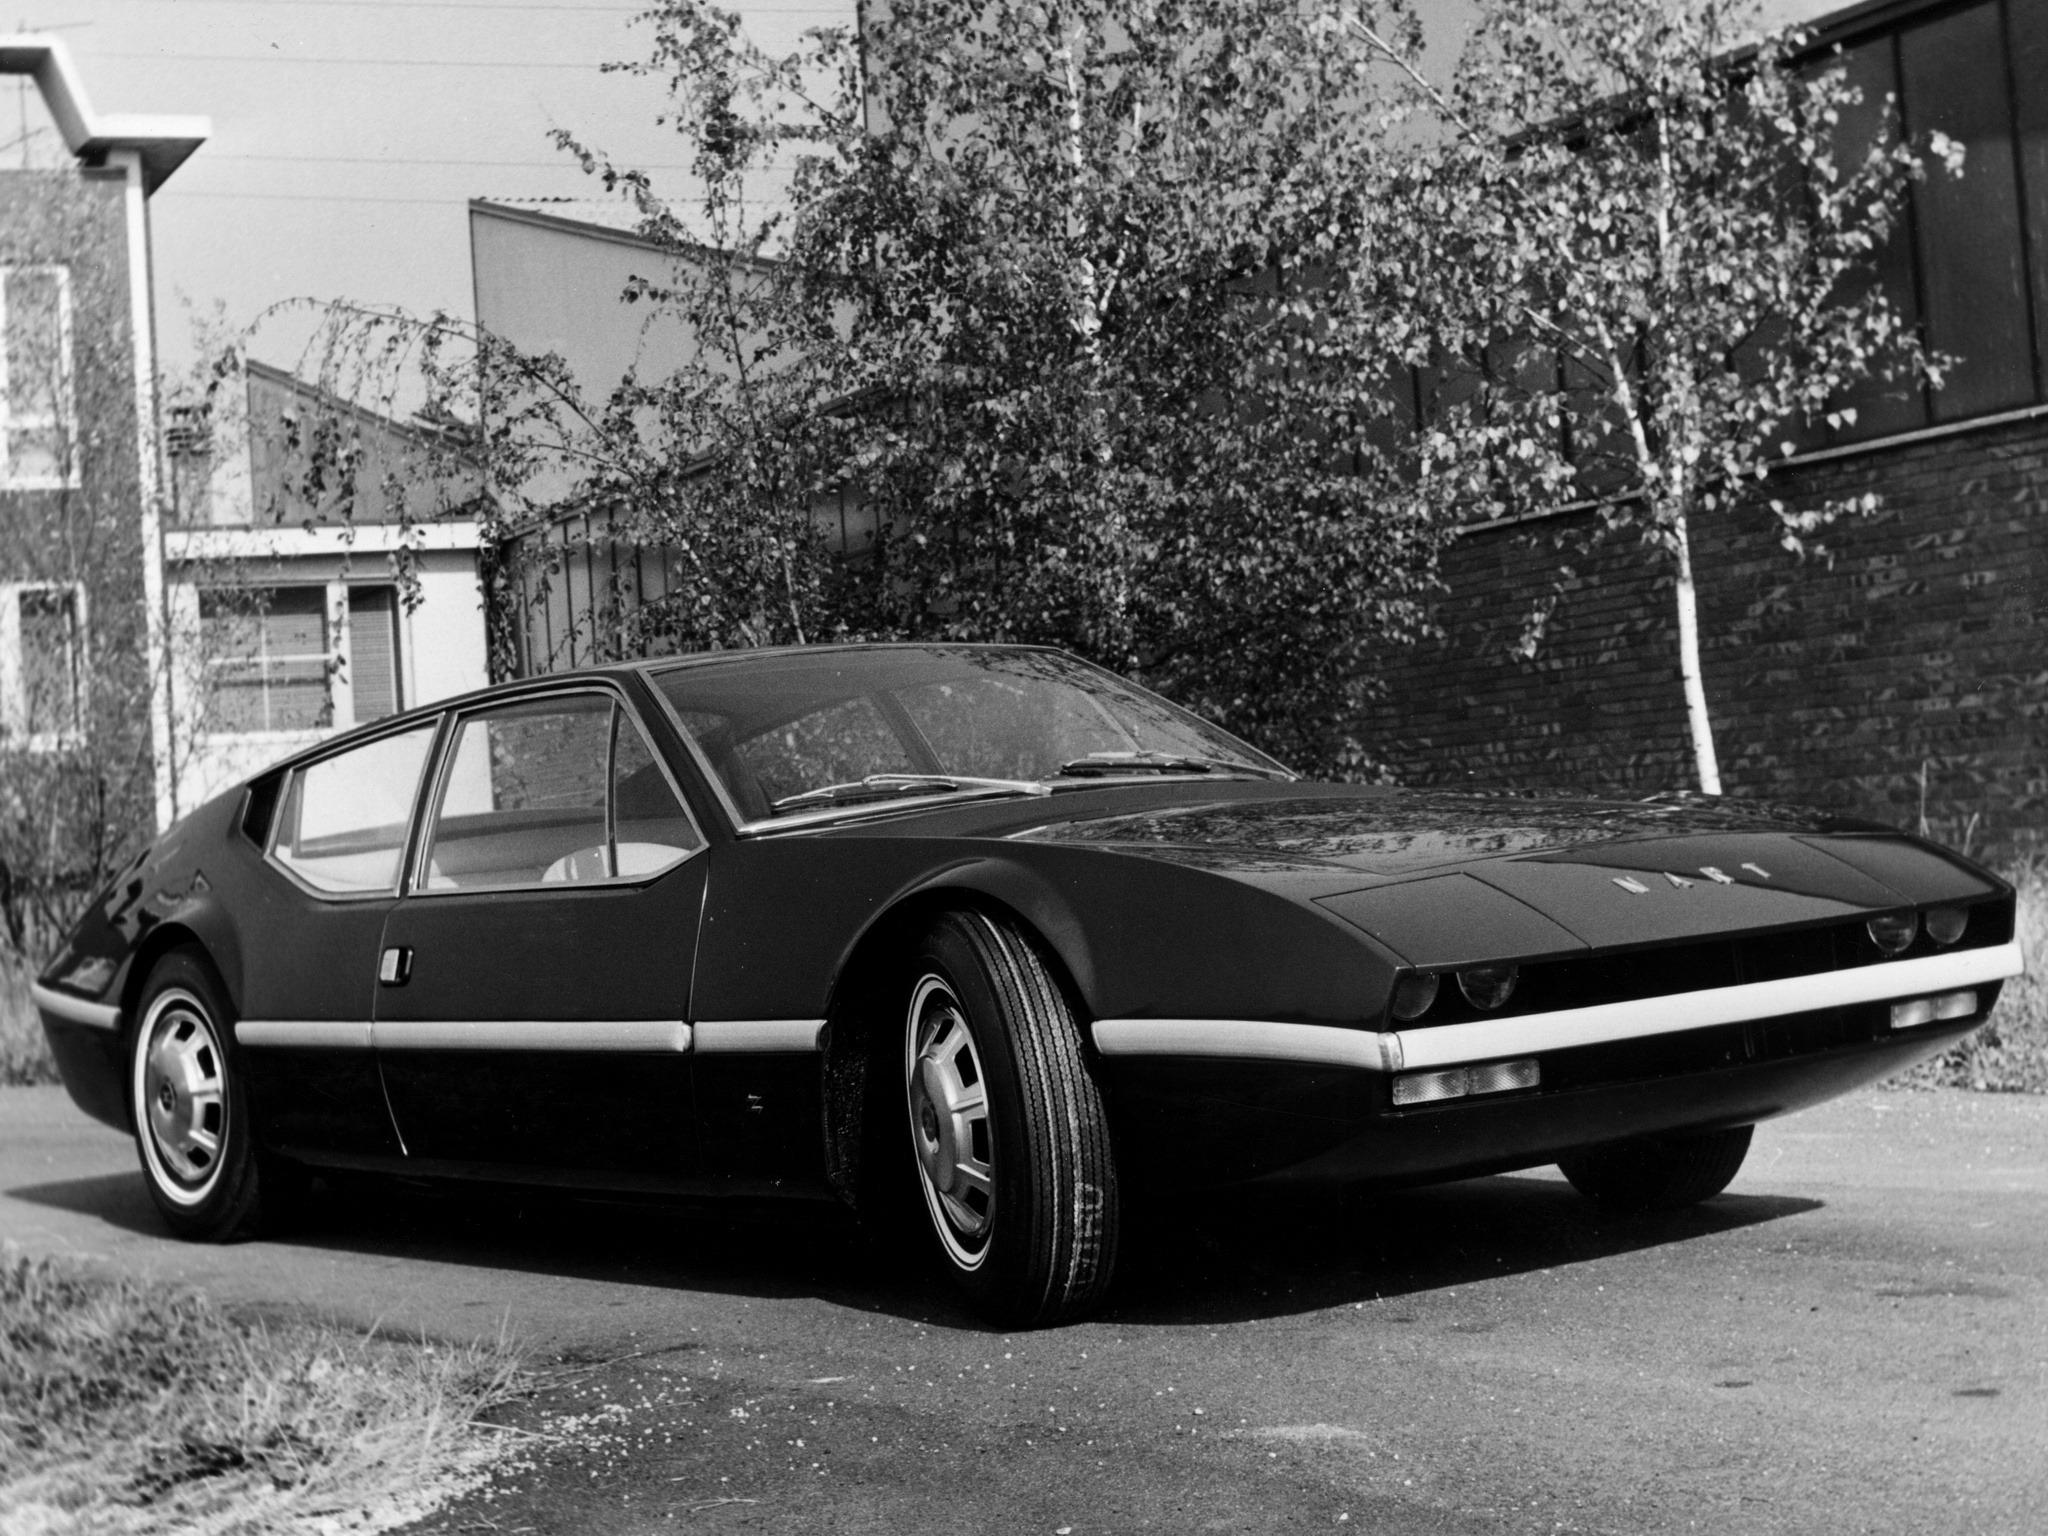 Subaru Dealer Near Me >> Cadillac NART (1970) - Old Concept Cars